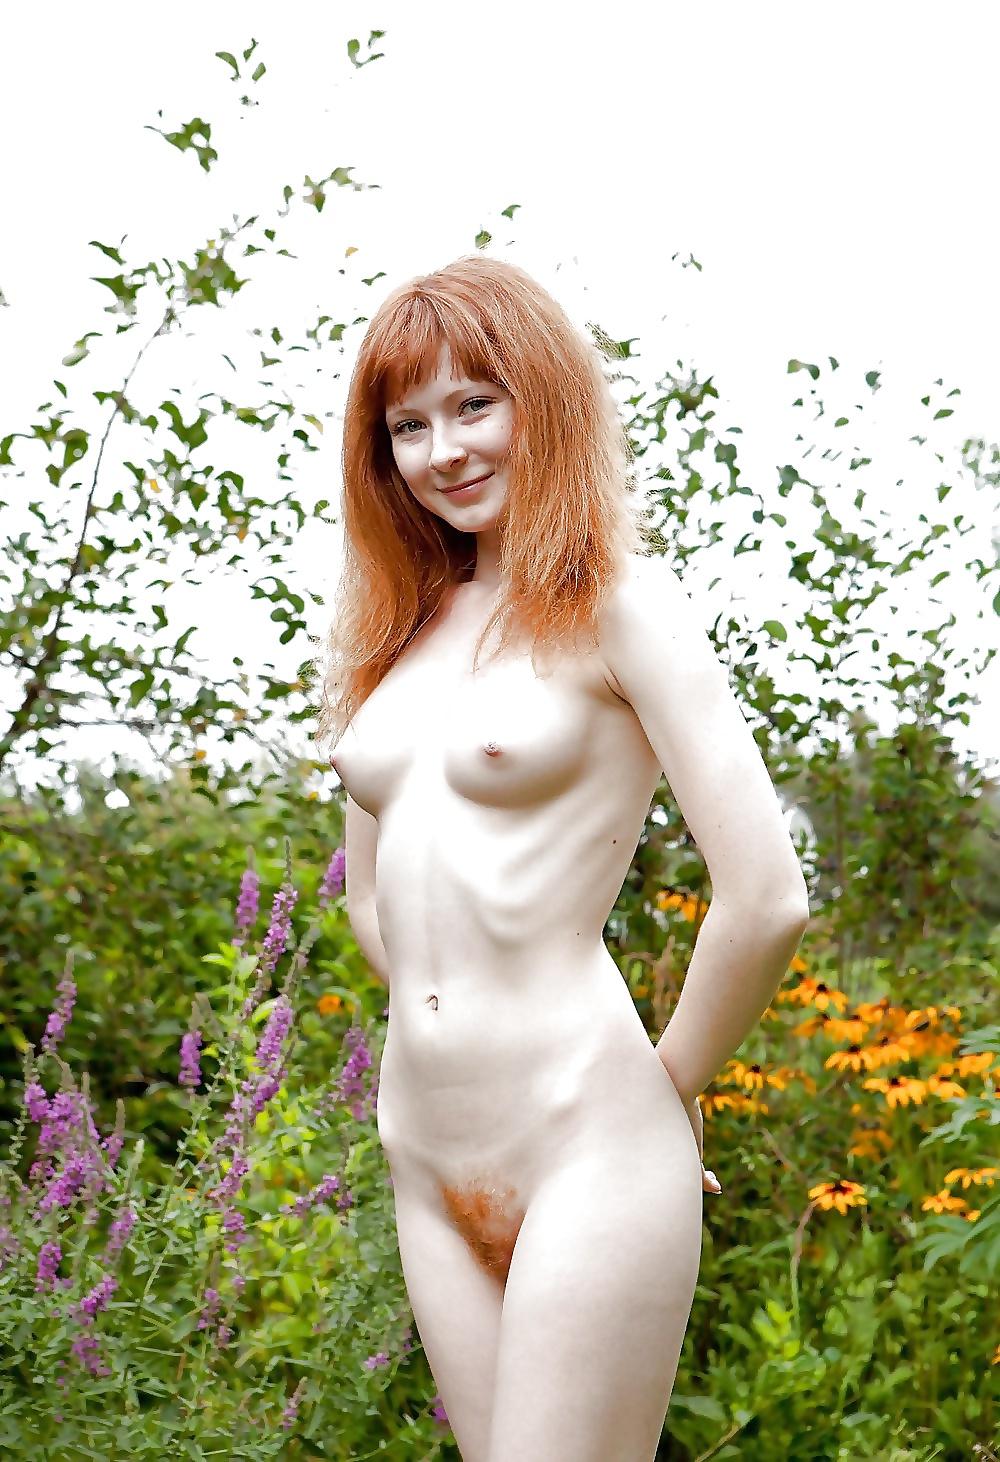 Nacktes Mädchen hat helle Haut